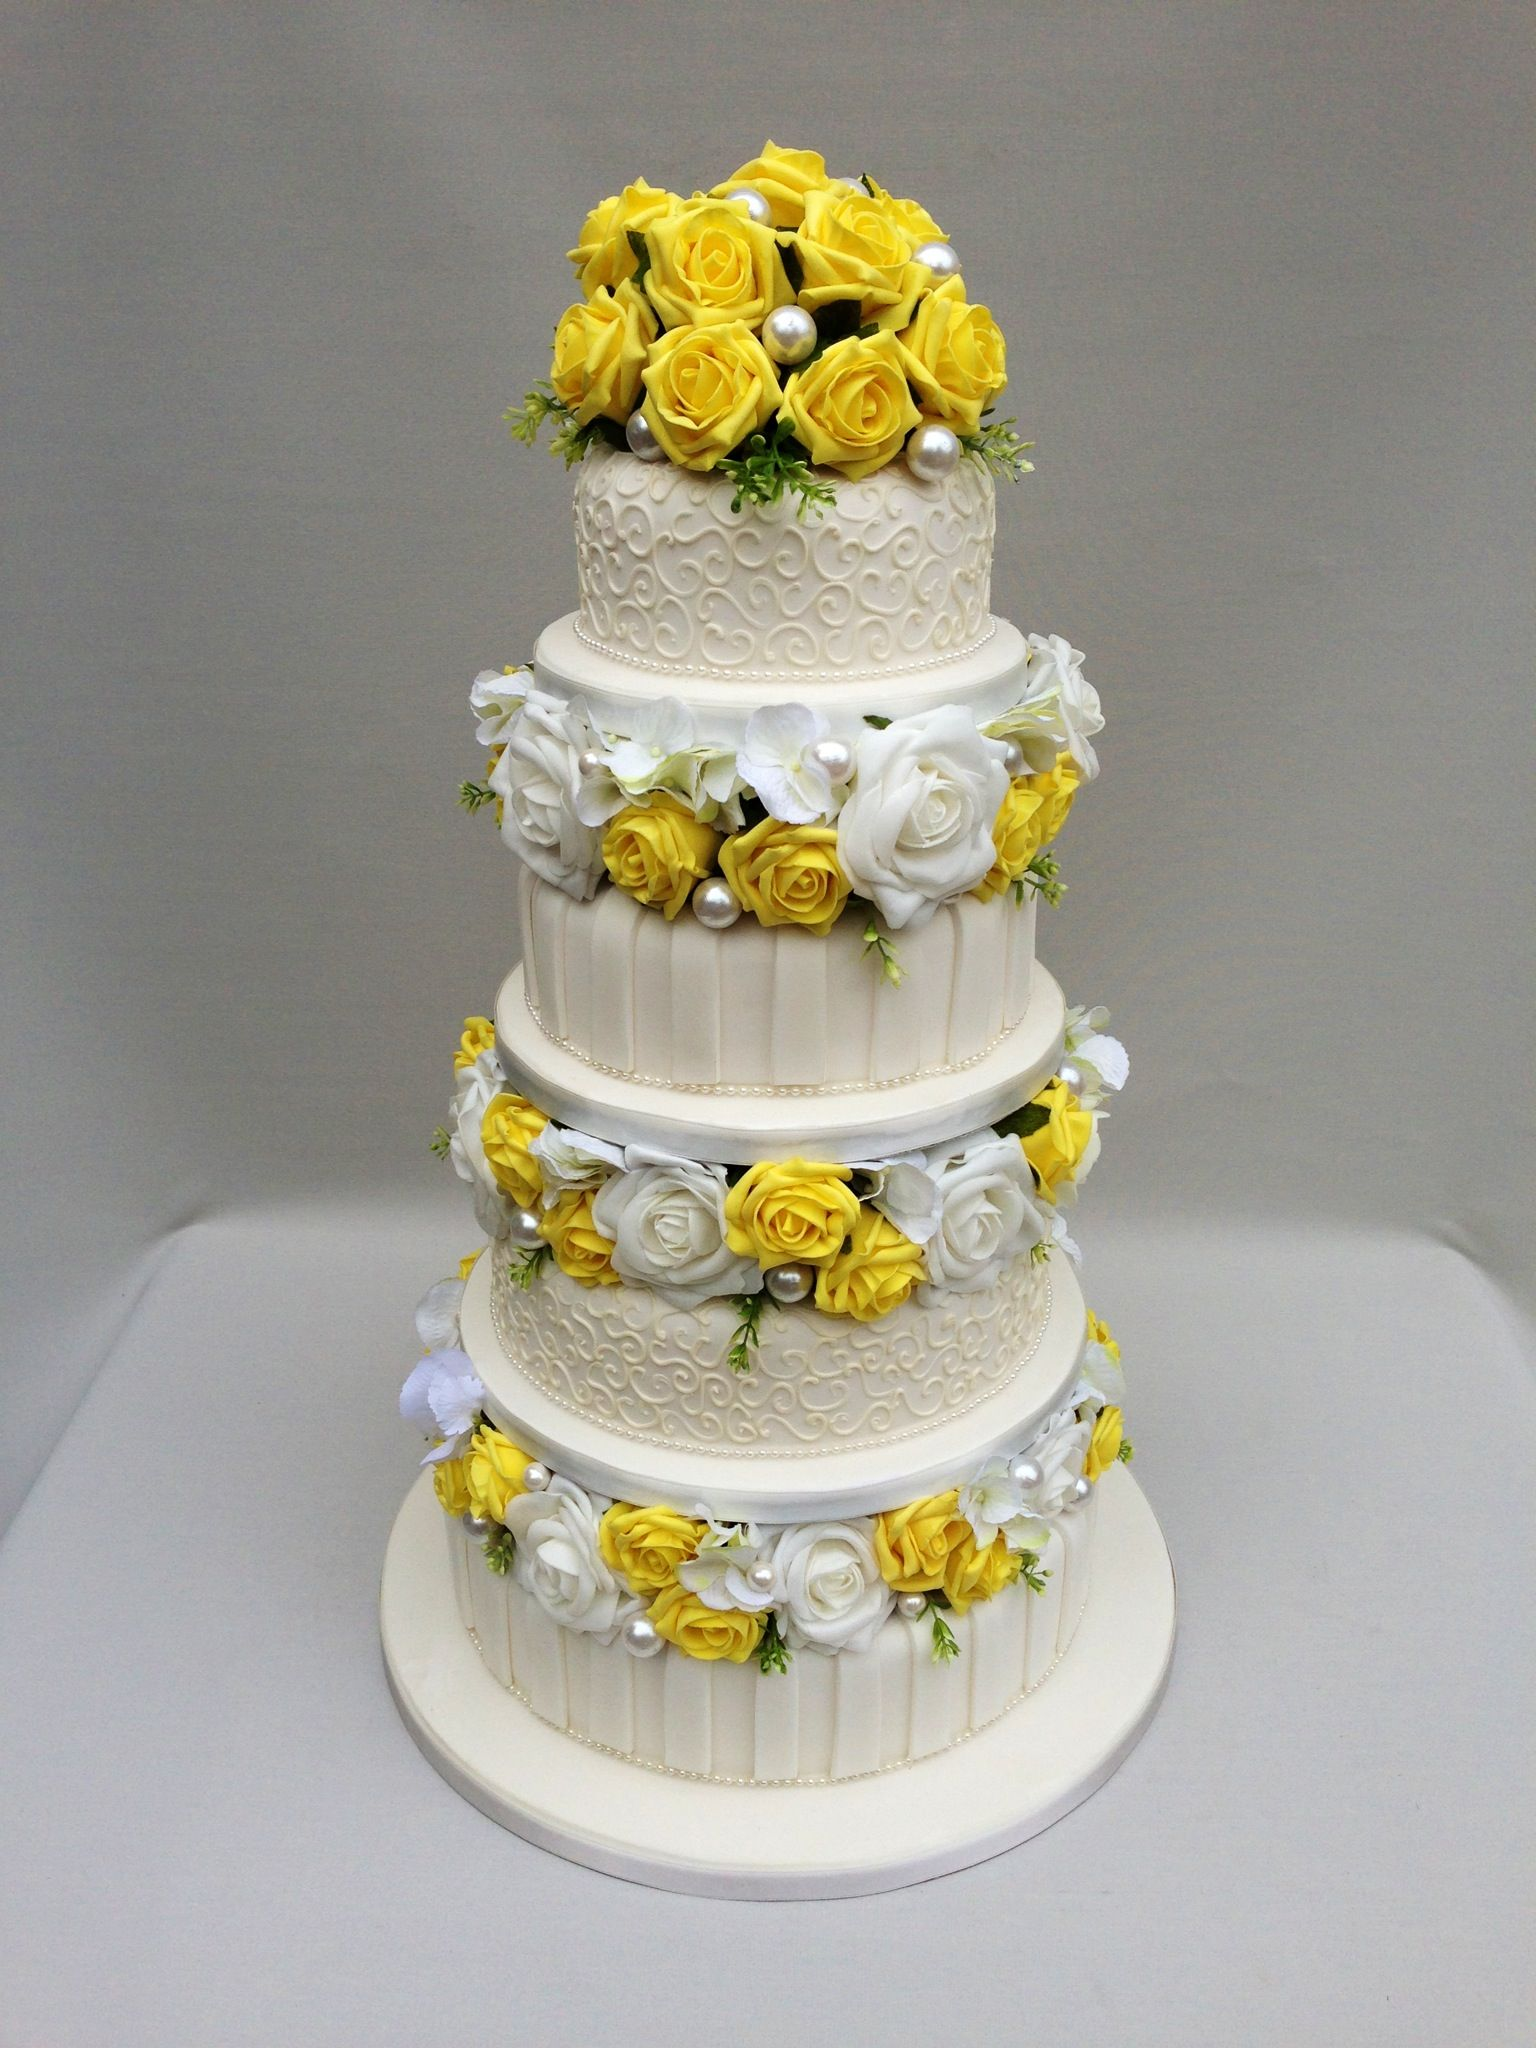 10++ 6 inch cake ring nz ideas in 2021